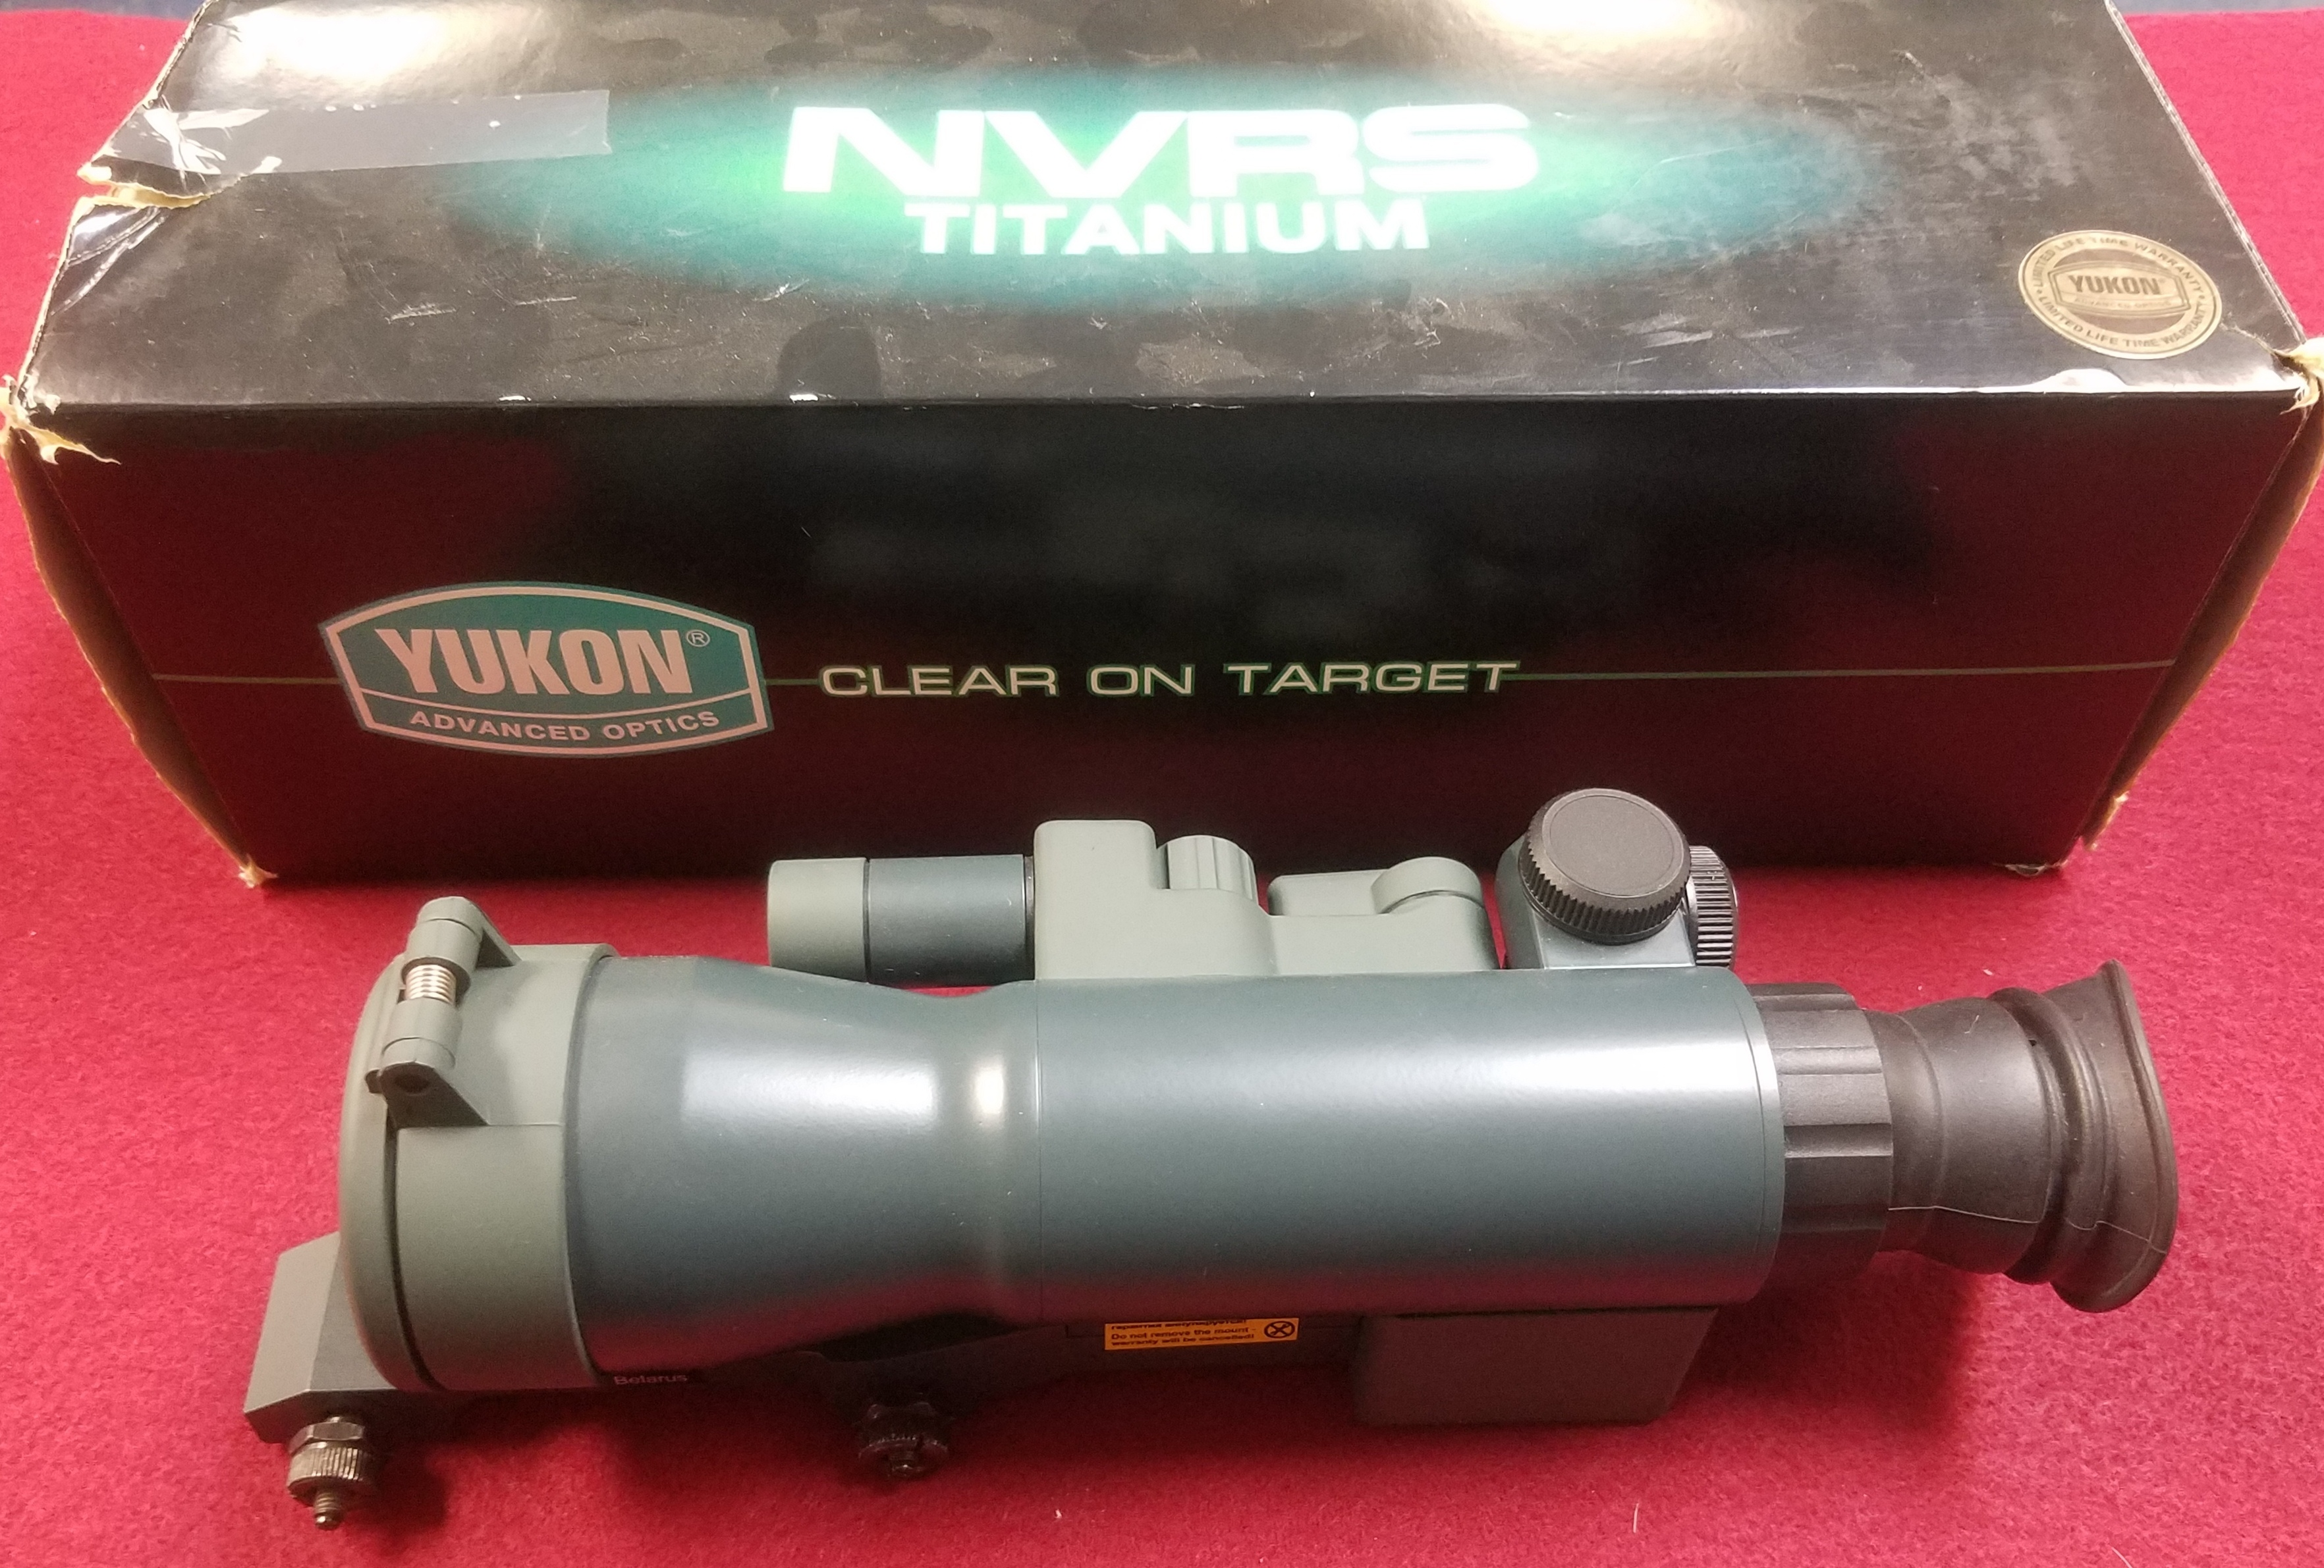 YUKON - NVRS - 2.5X50 NIGHT VISION SCOPE